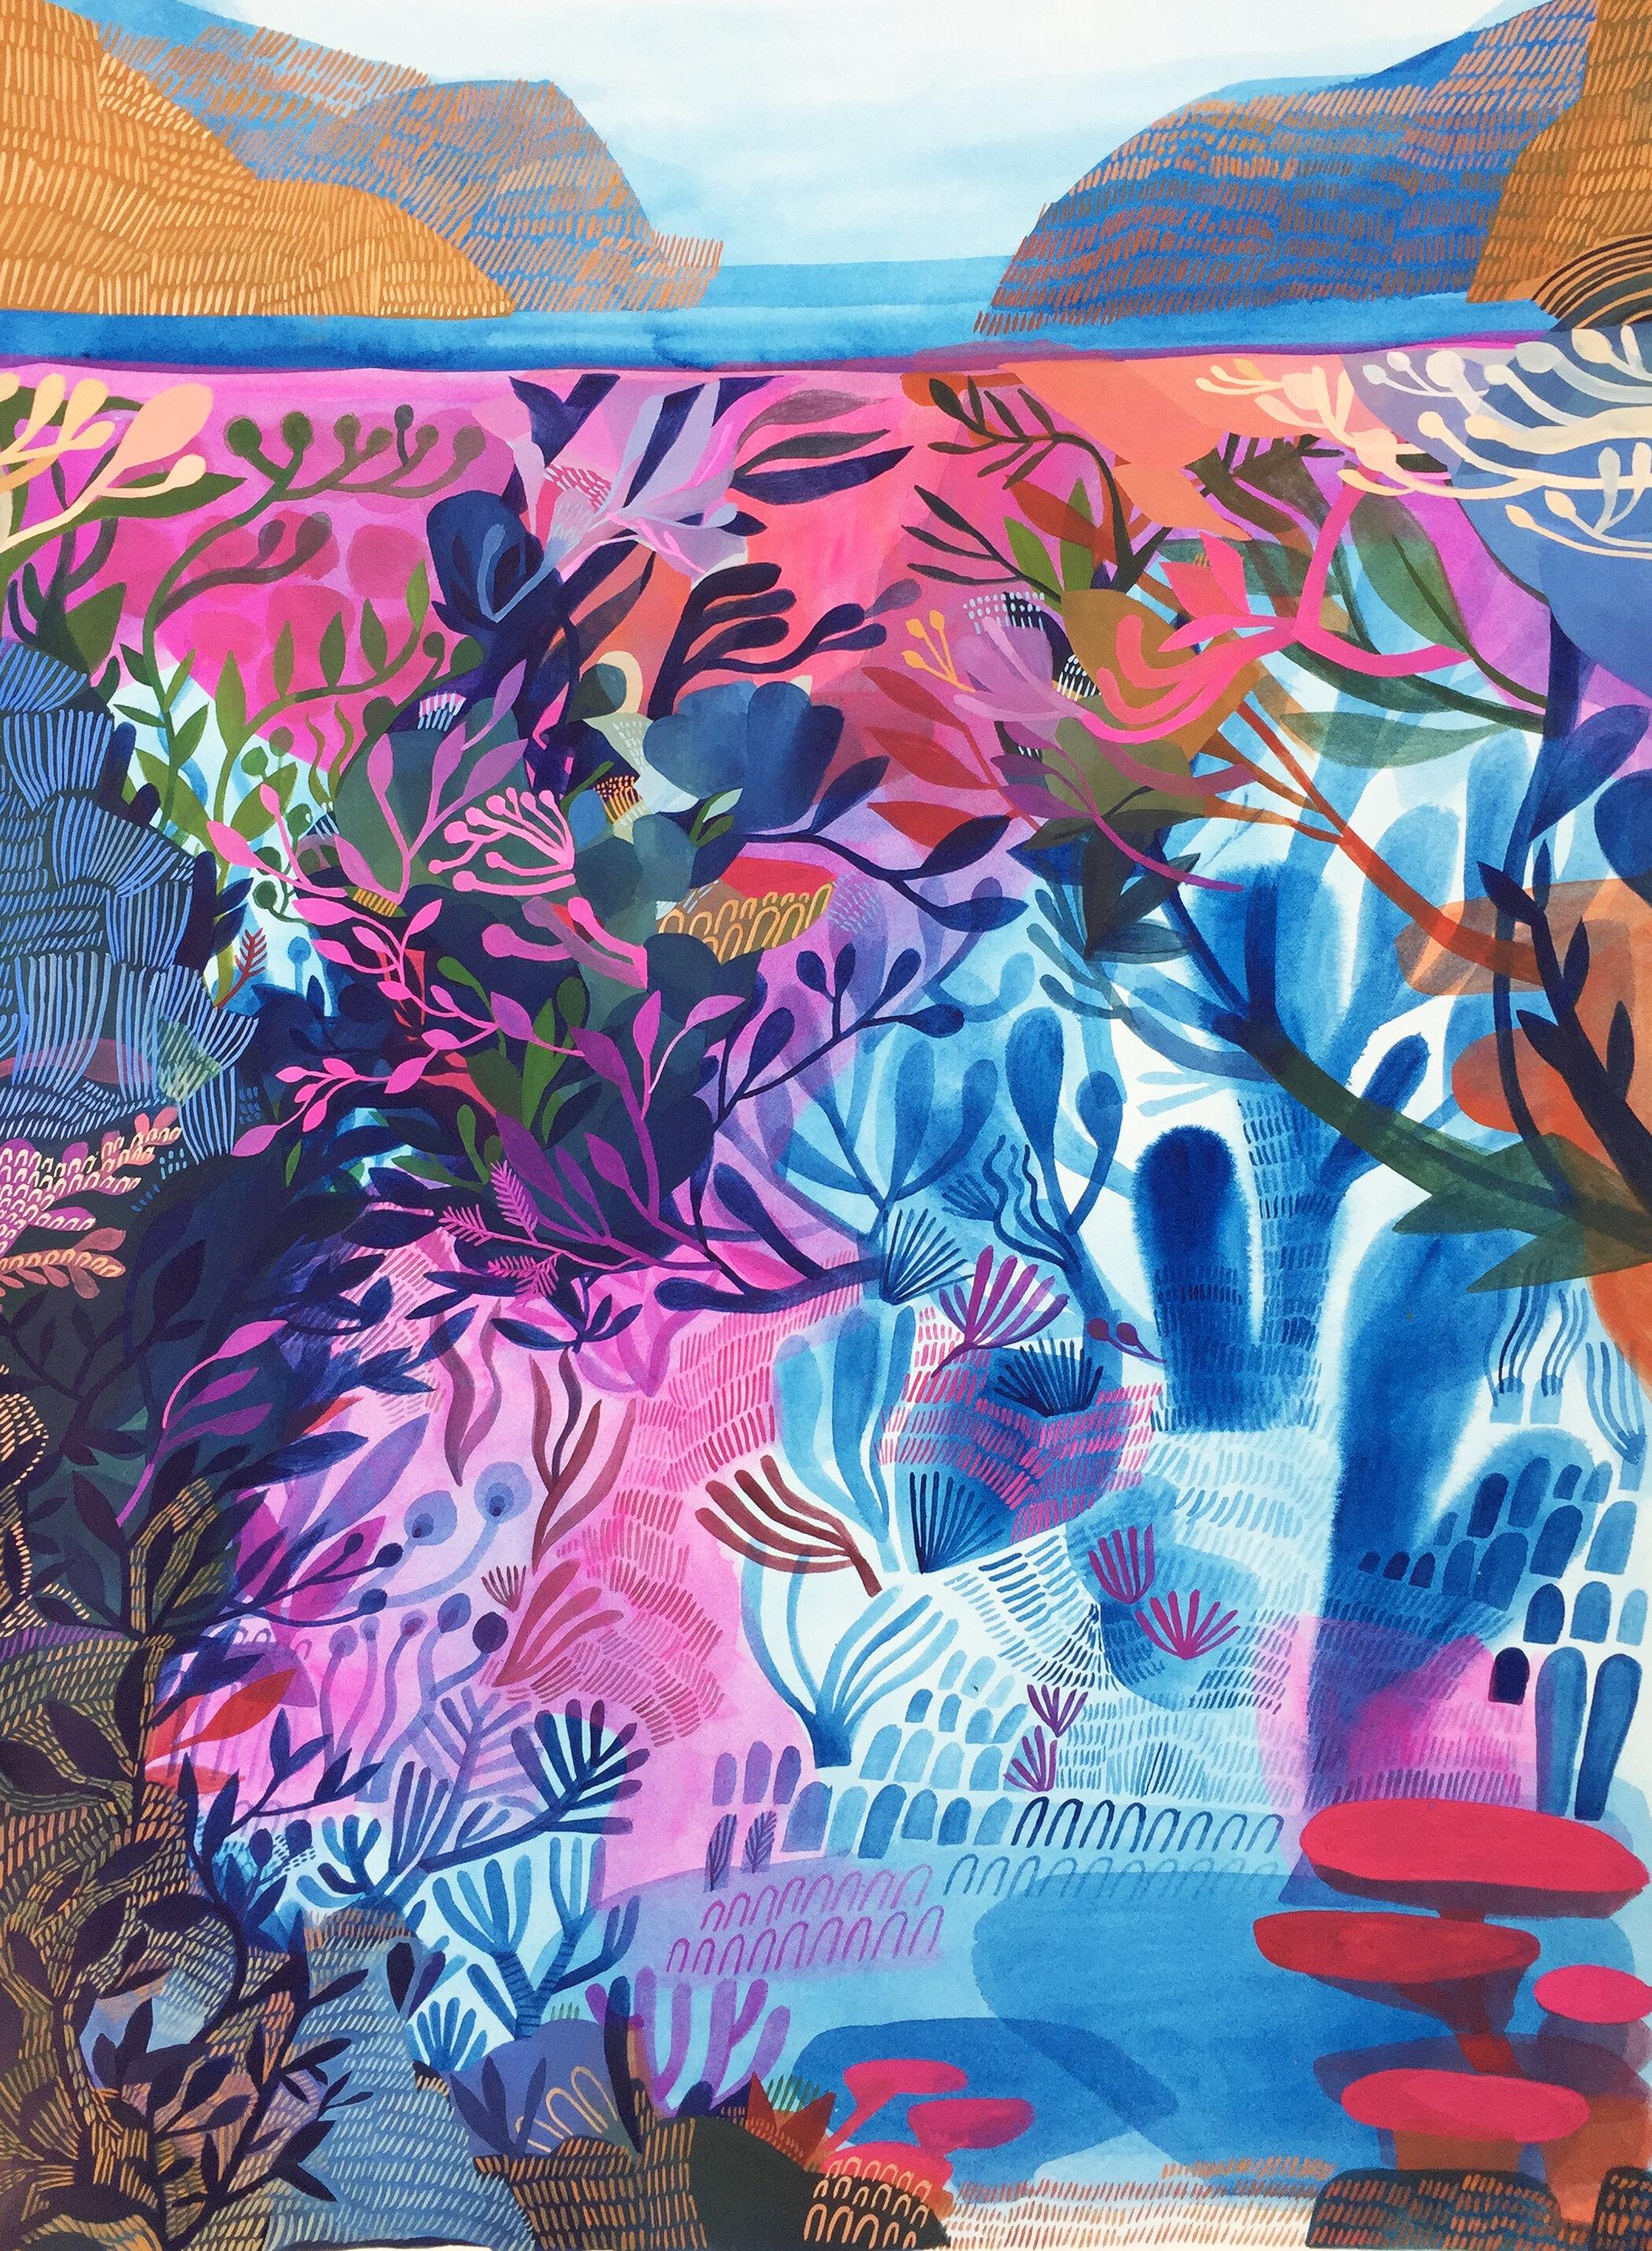 'Tidal Current' / Ashley Amery / 2019 / 56 x 76 cm / Gouache on Paper